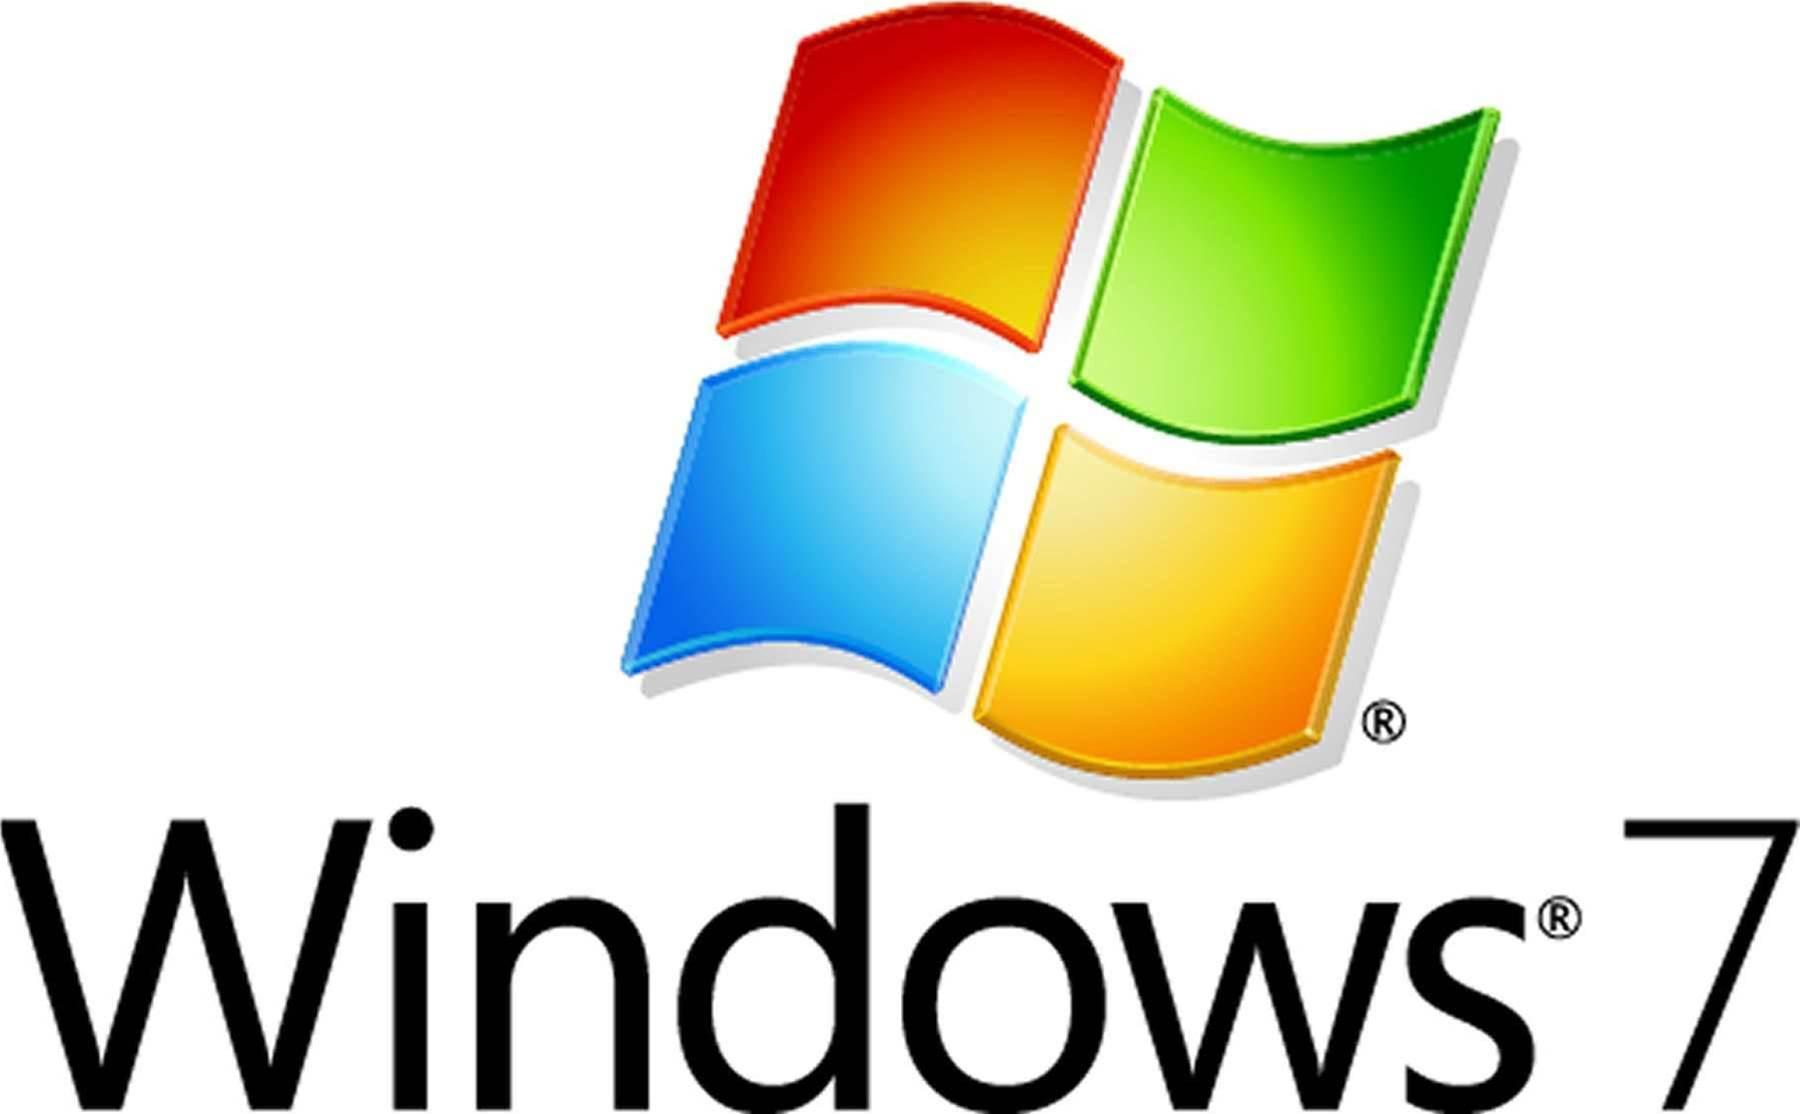 65% of Windows devices run Windows 7, where 600 vulnerabilities reside